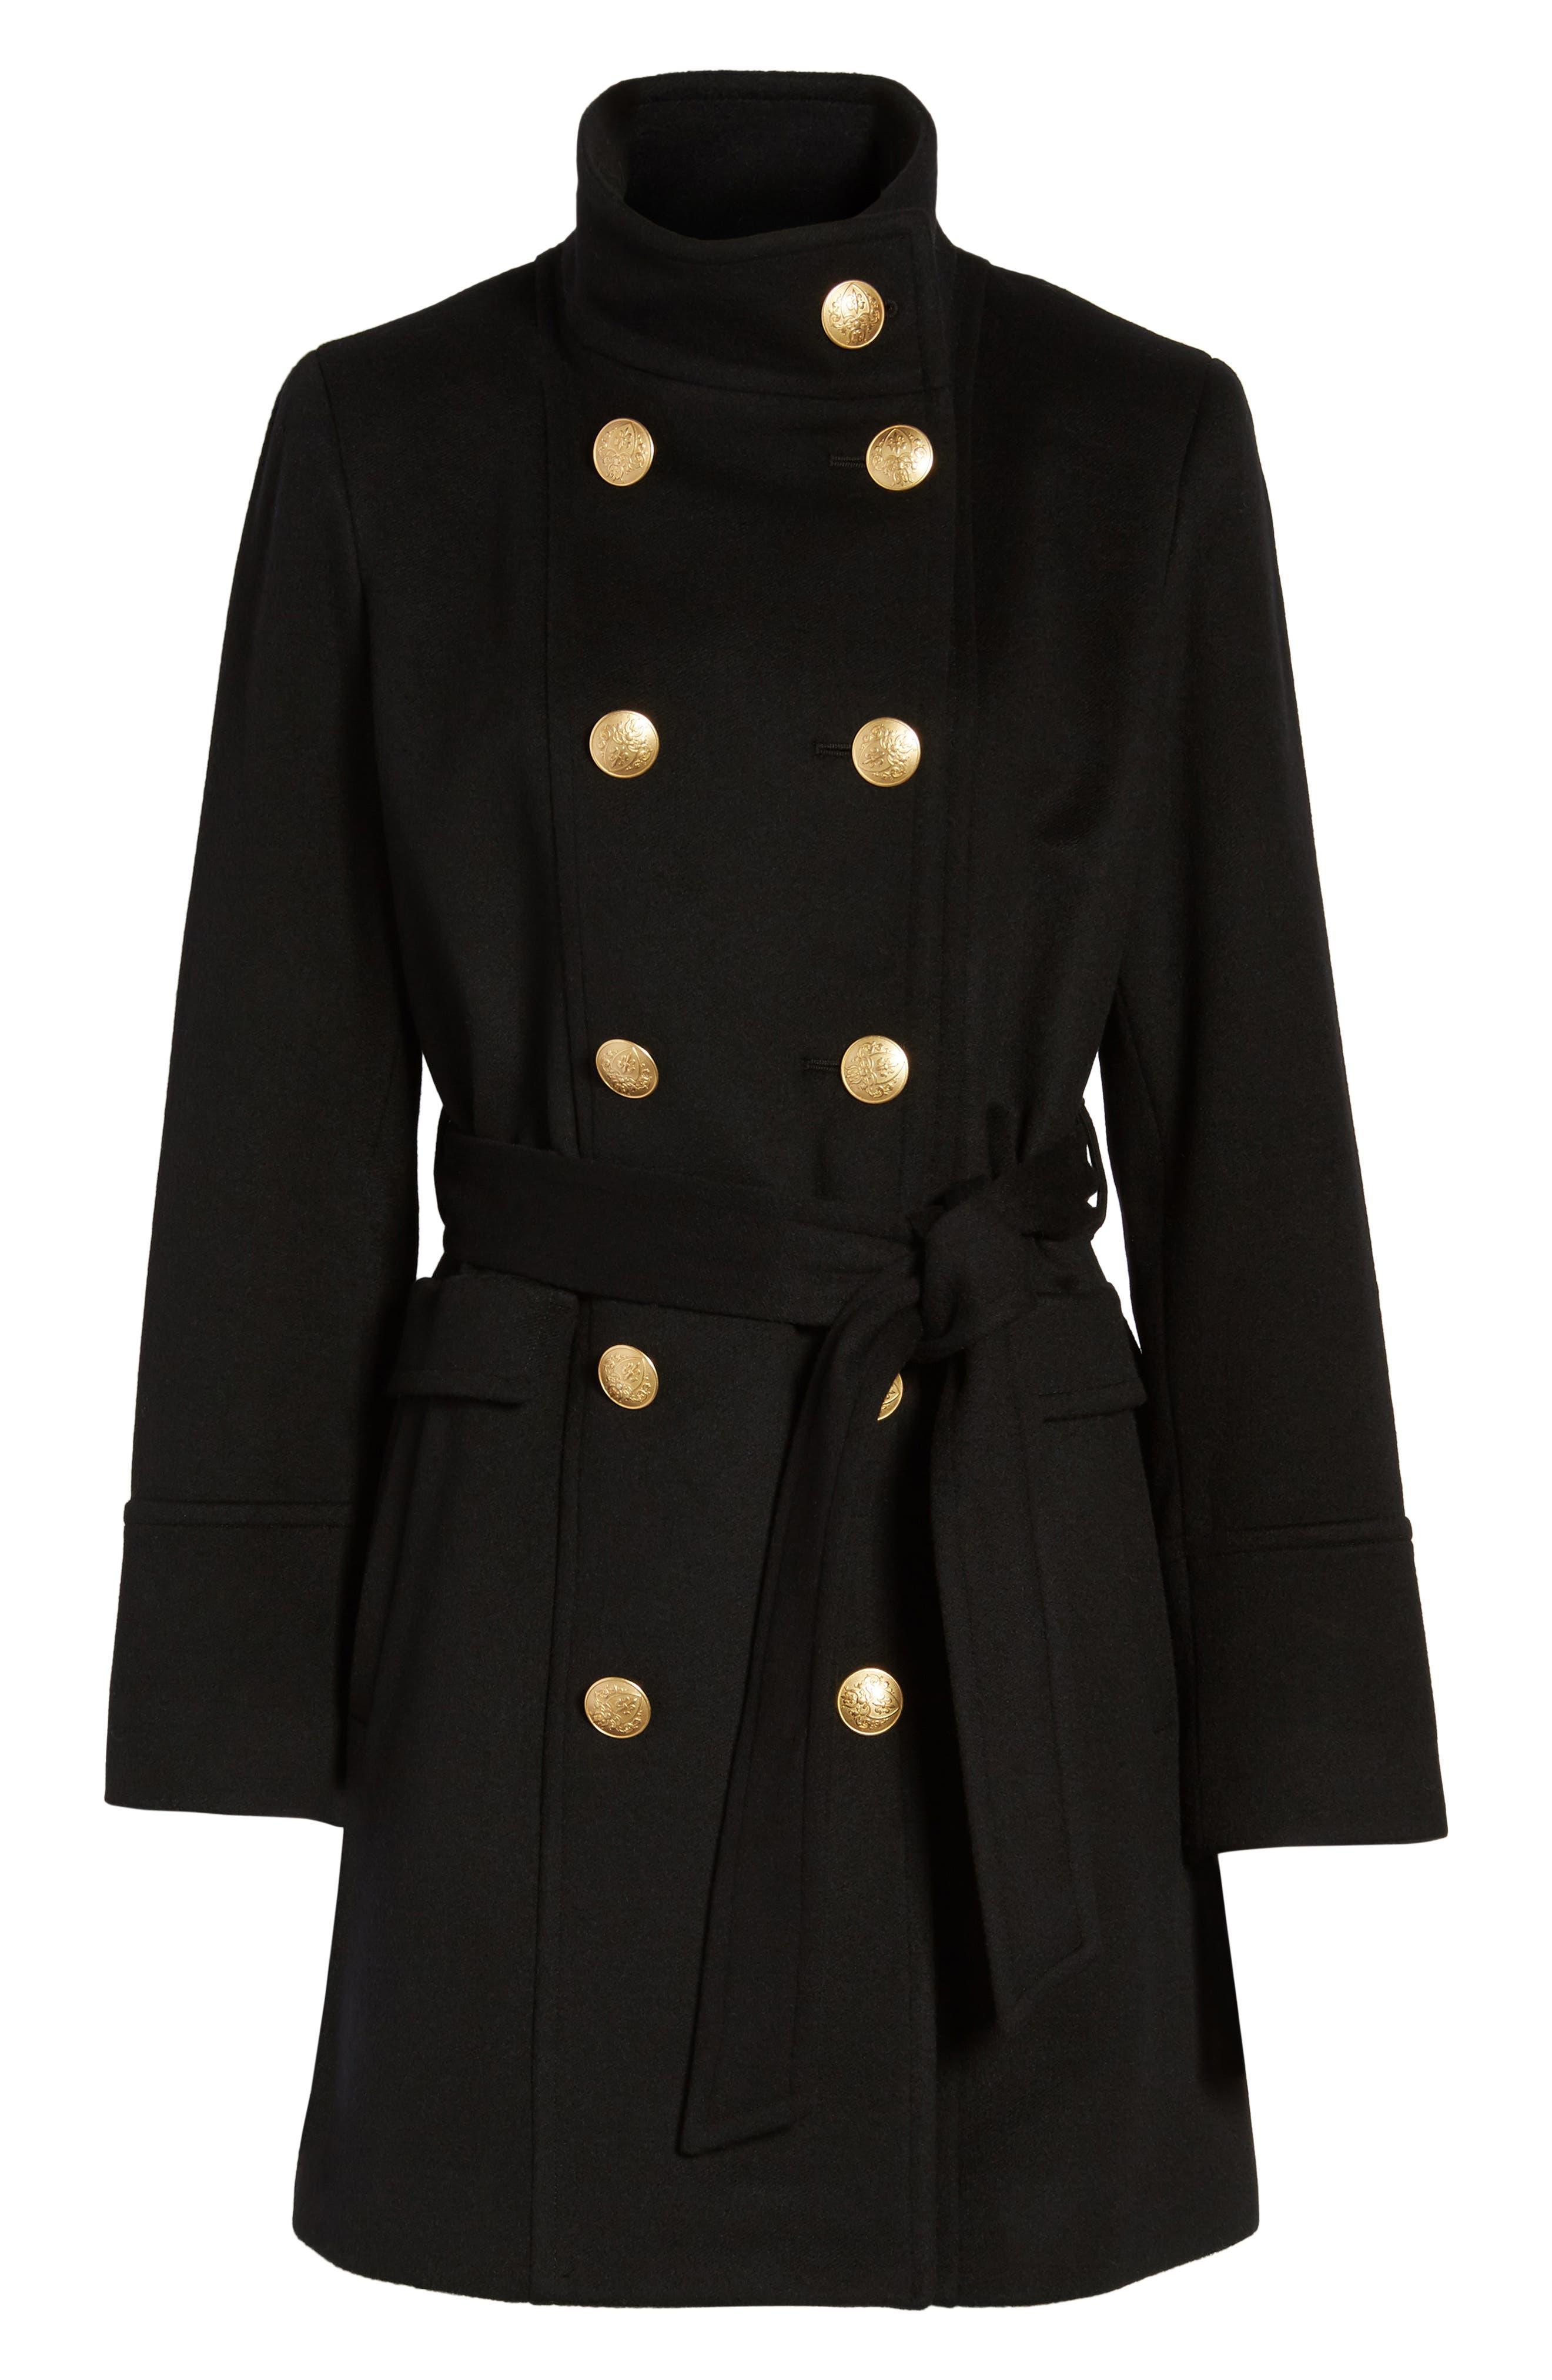 Wool & Cashmere Blend Military Coat,                             Alternate thumbnail 5, color,                             001